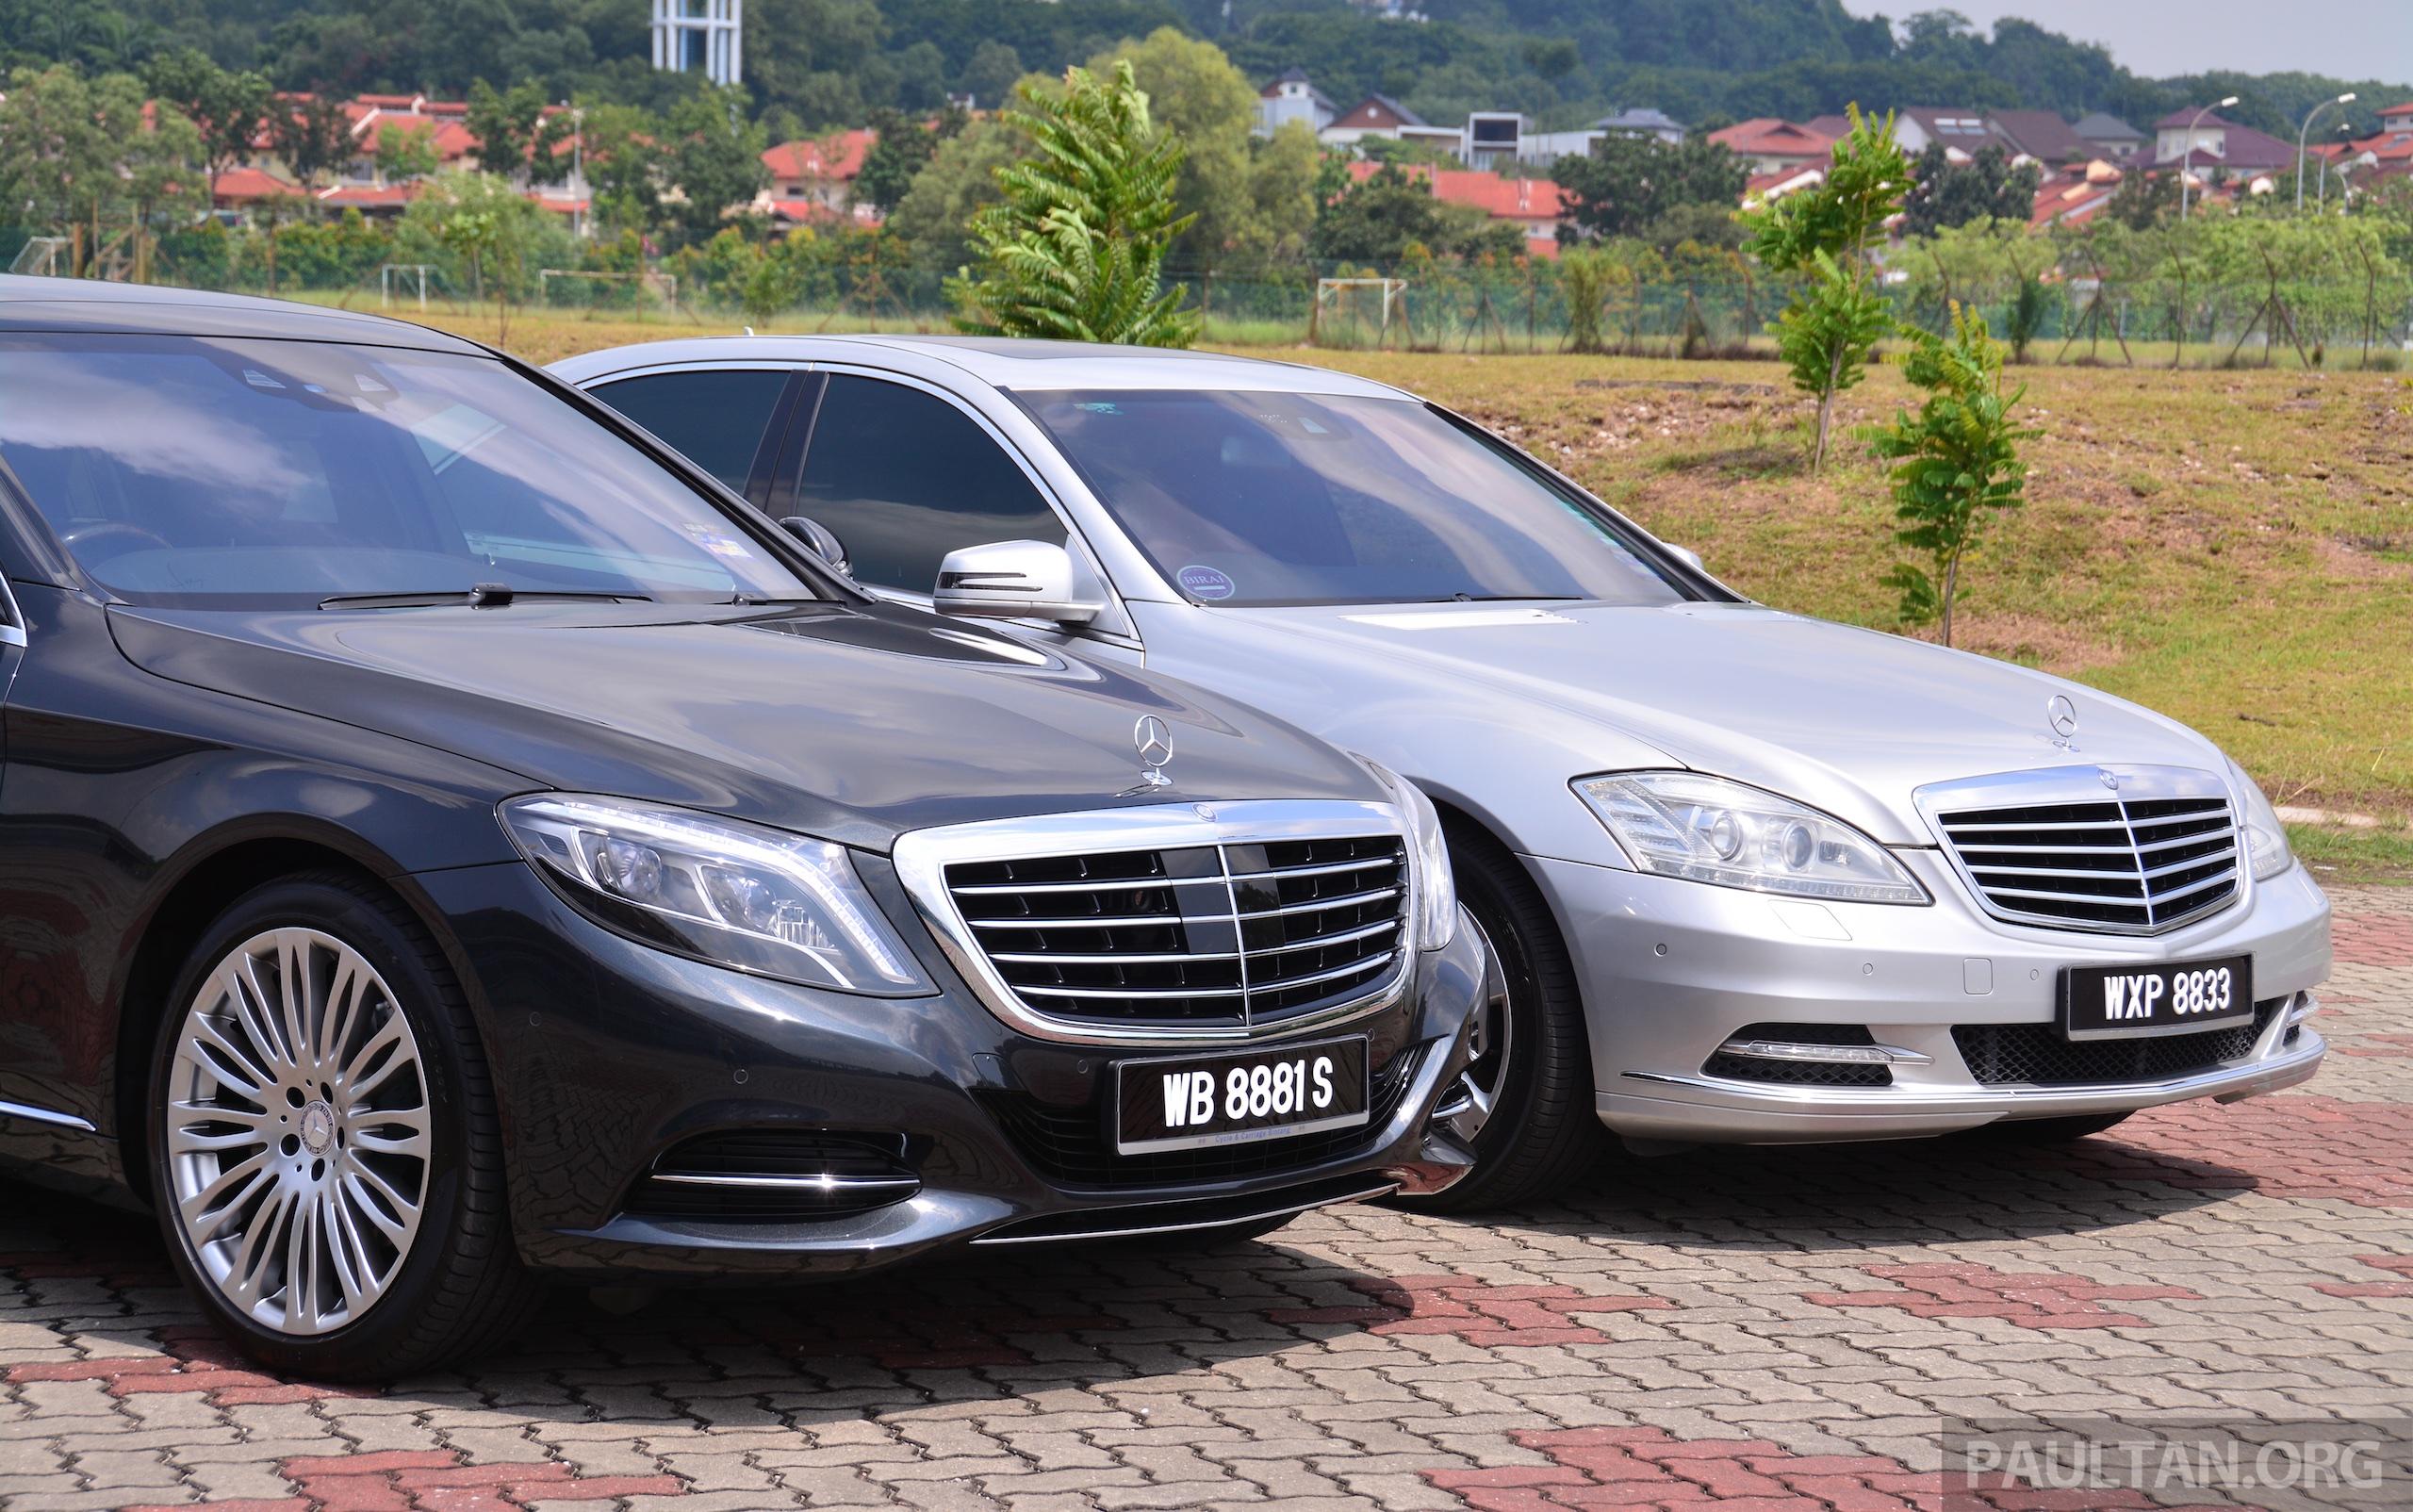 GALLERY: Mercedes-Benz S-Class – W222 vs W221 Image 371816